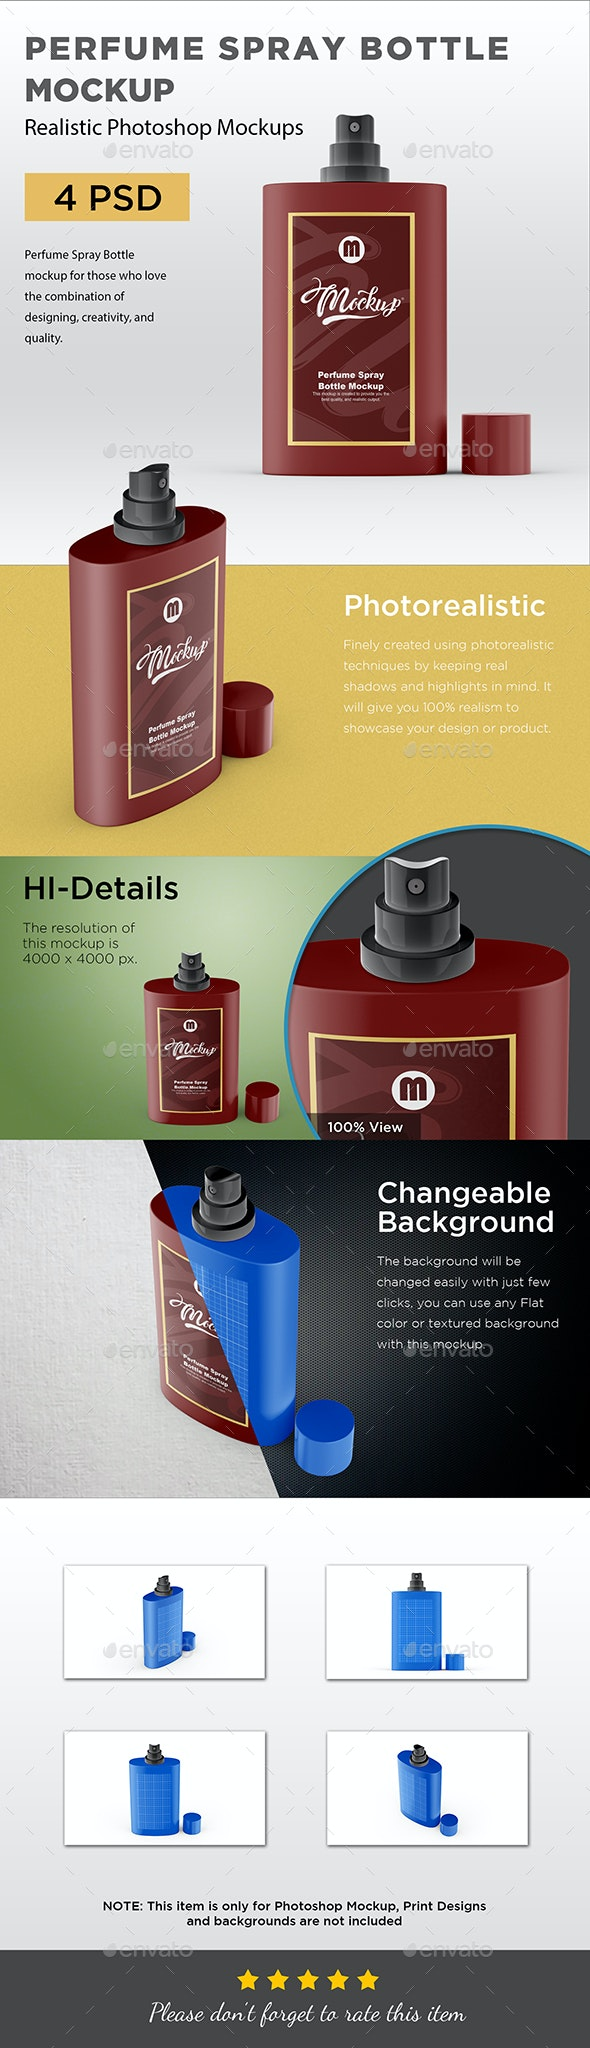 Perfume Spray Bottle Mockup - Packaging Product Mock-Ups